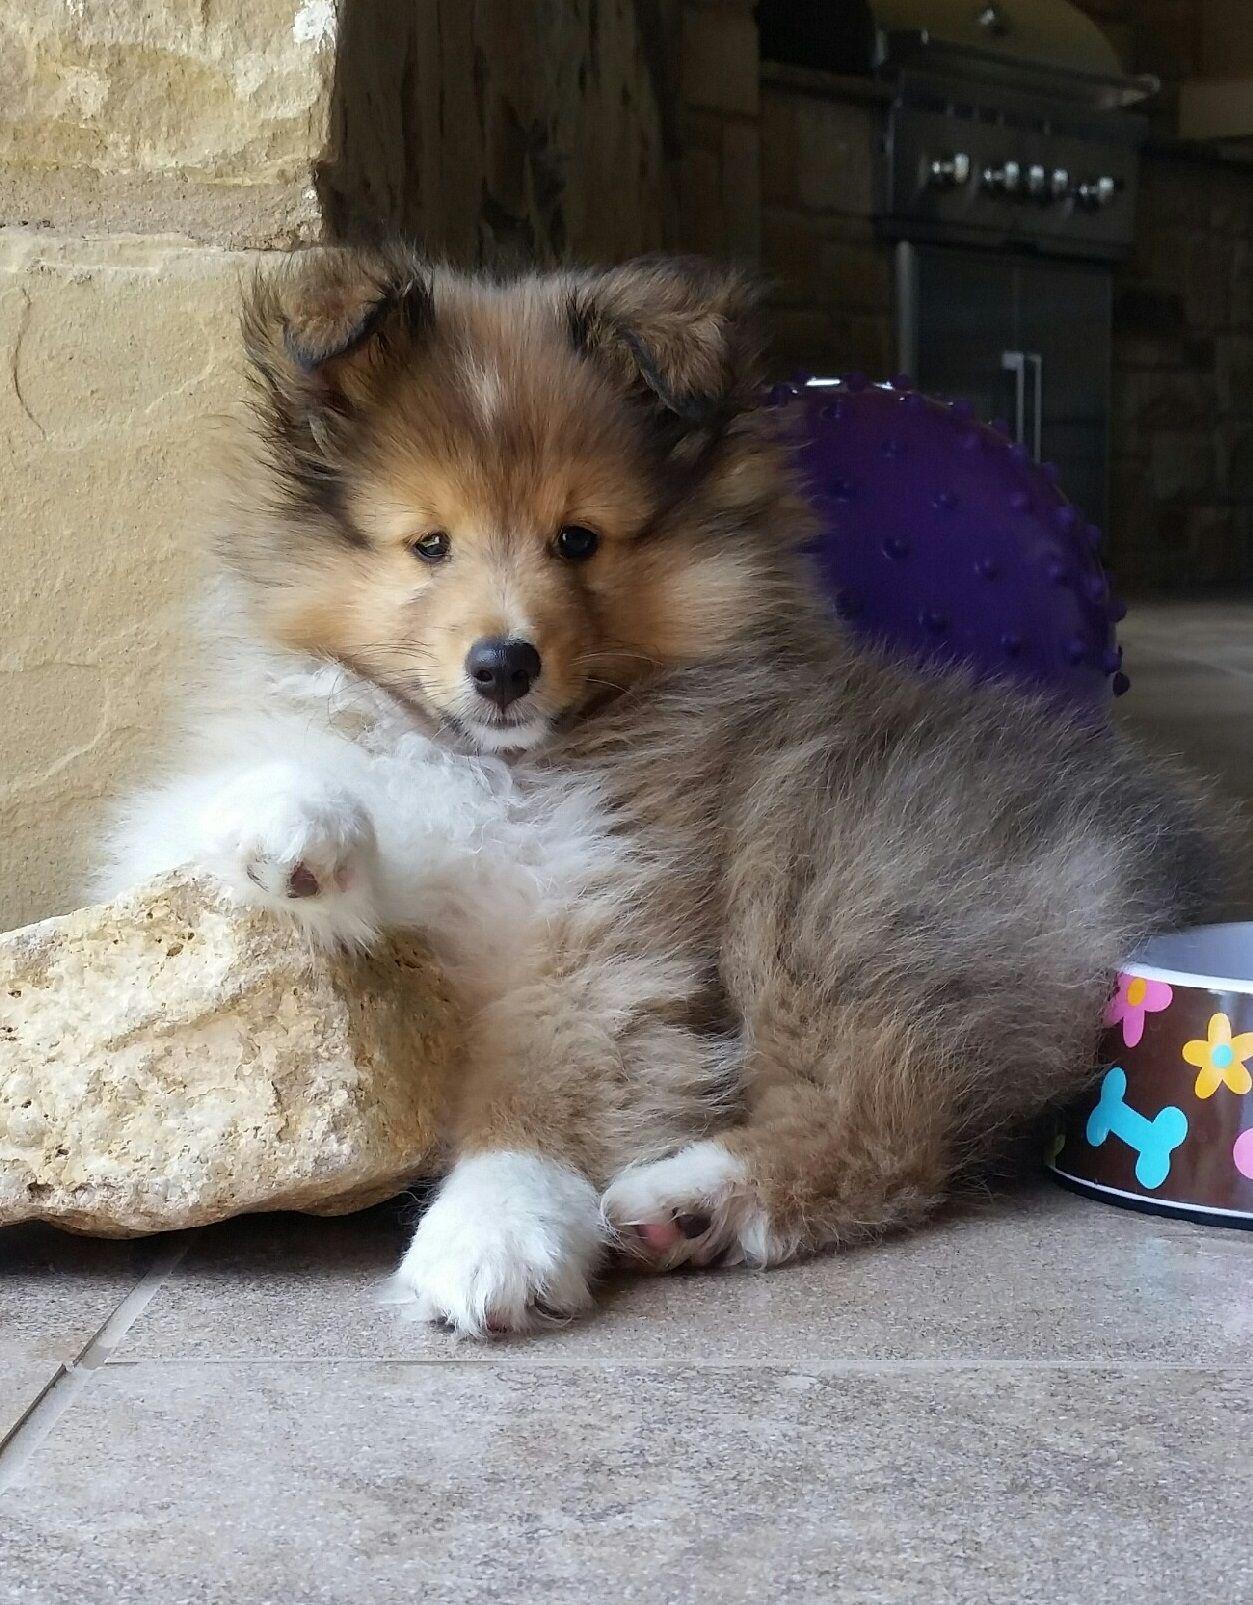 Shetland sheepdog energetic and playful miss you sweet sheltie